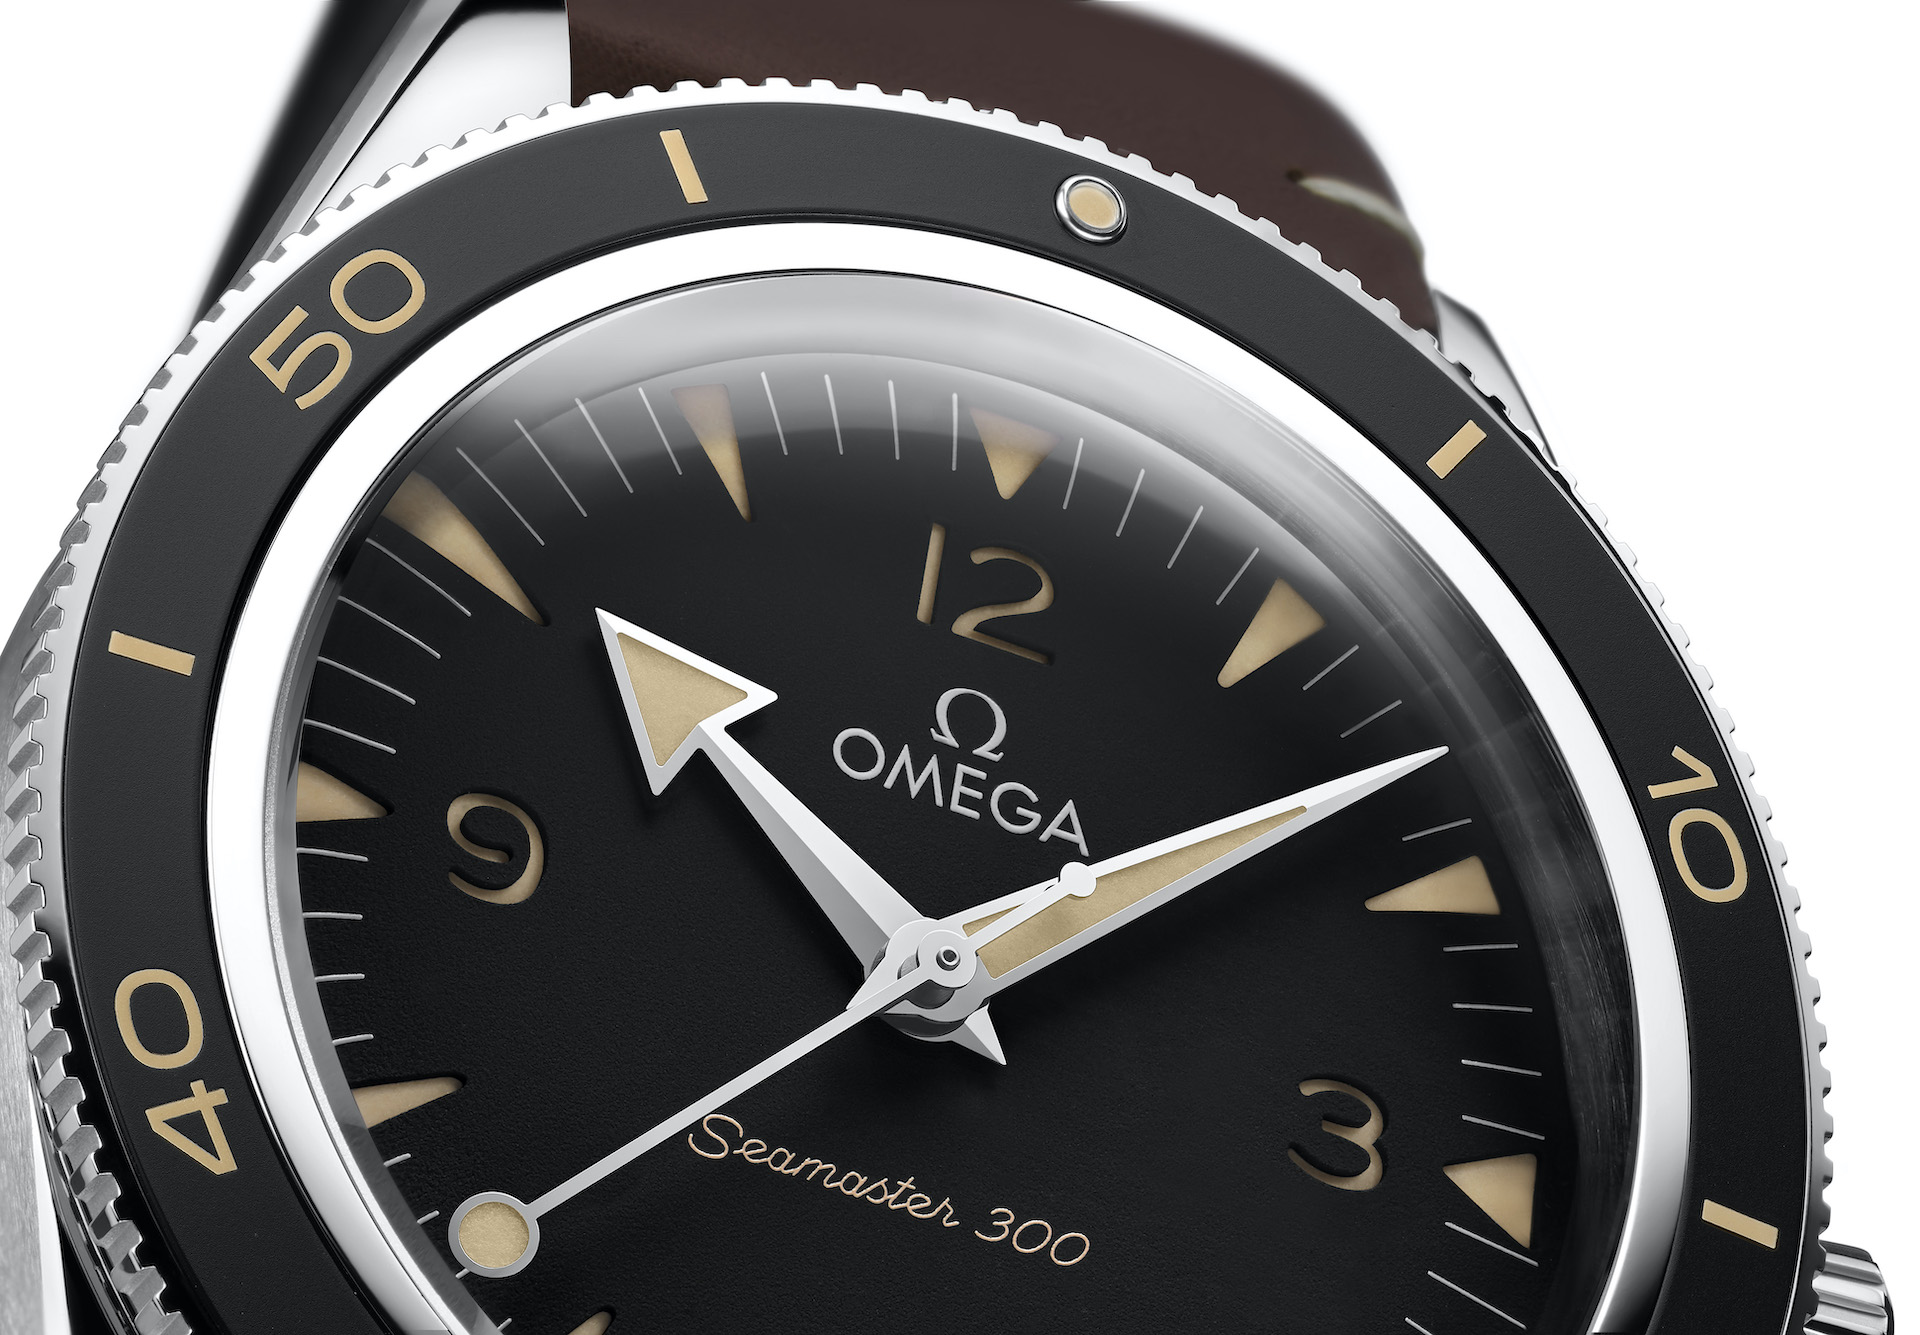 OMEGA_Seamaster300